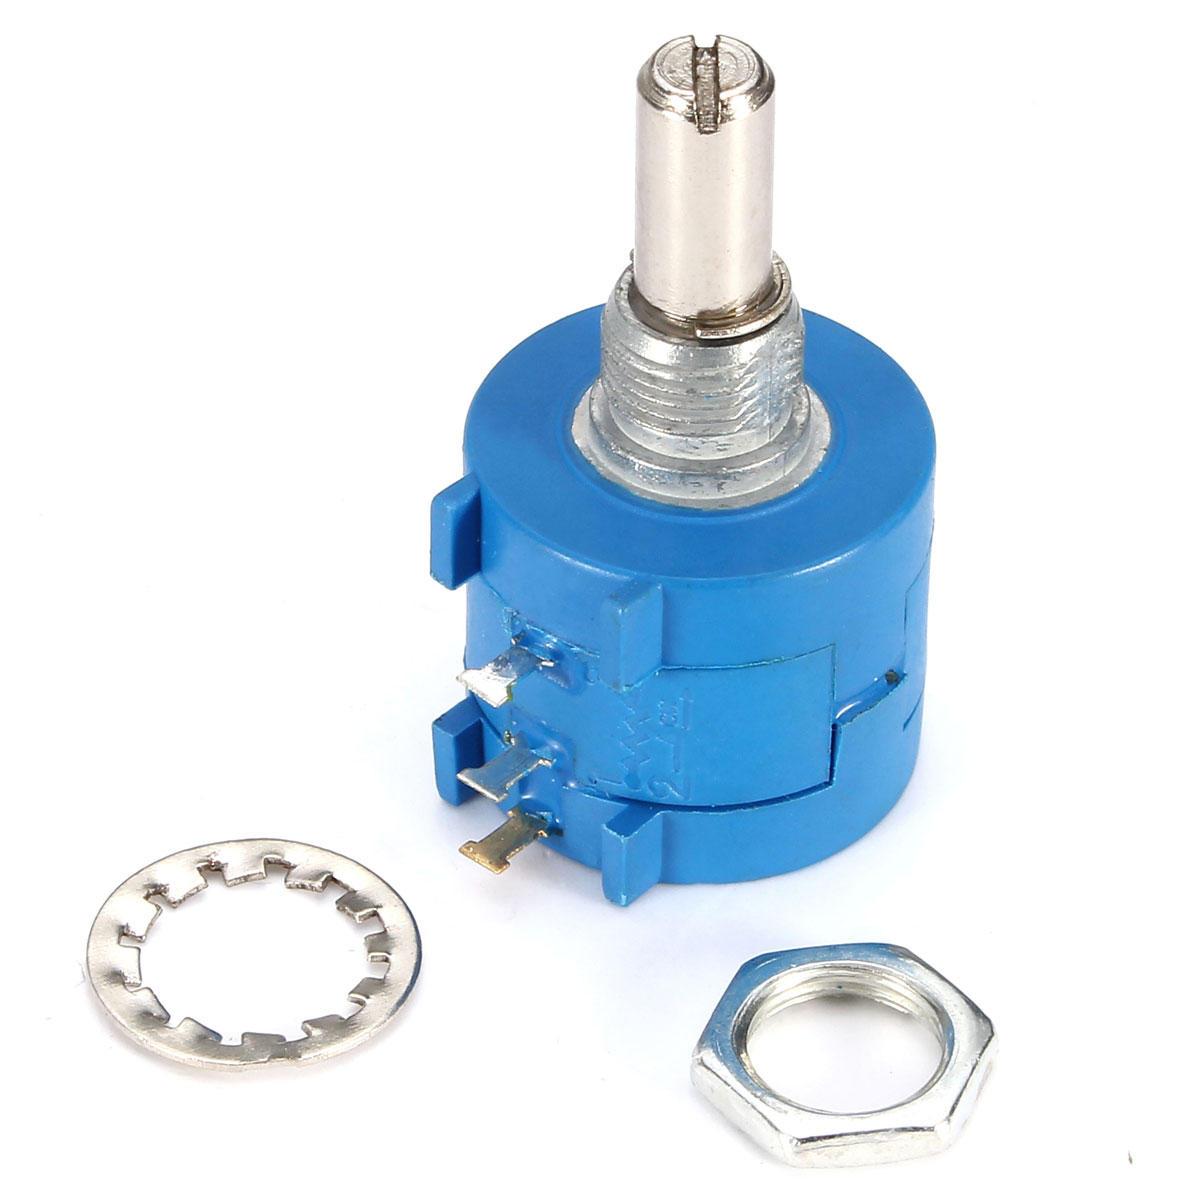 3Pcs 3590S-2-103L 10K Ohm BOURNS Rotary Wirewound Precision Potentiometer Pot 10 Turn